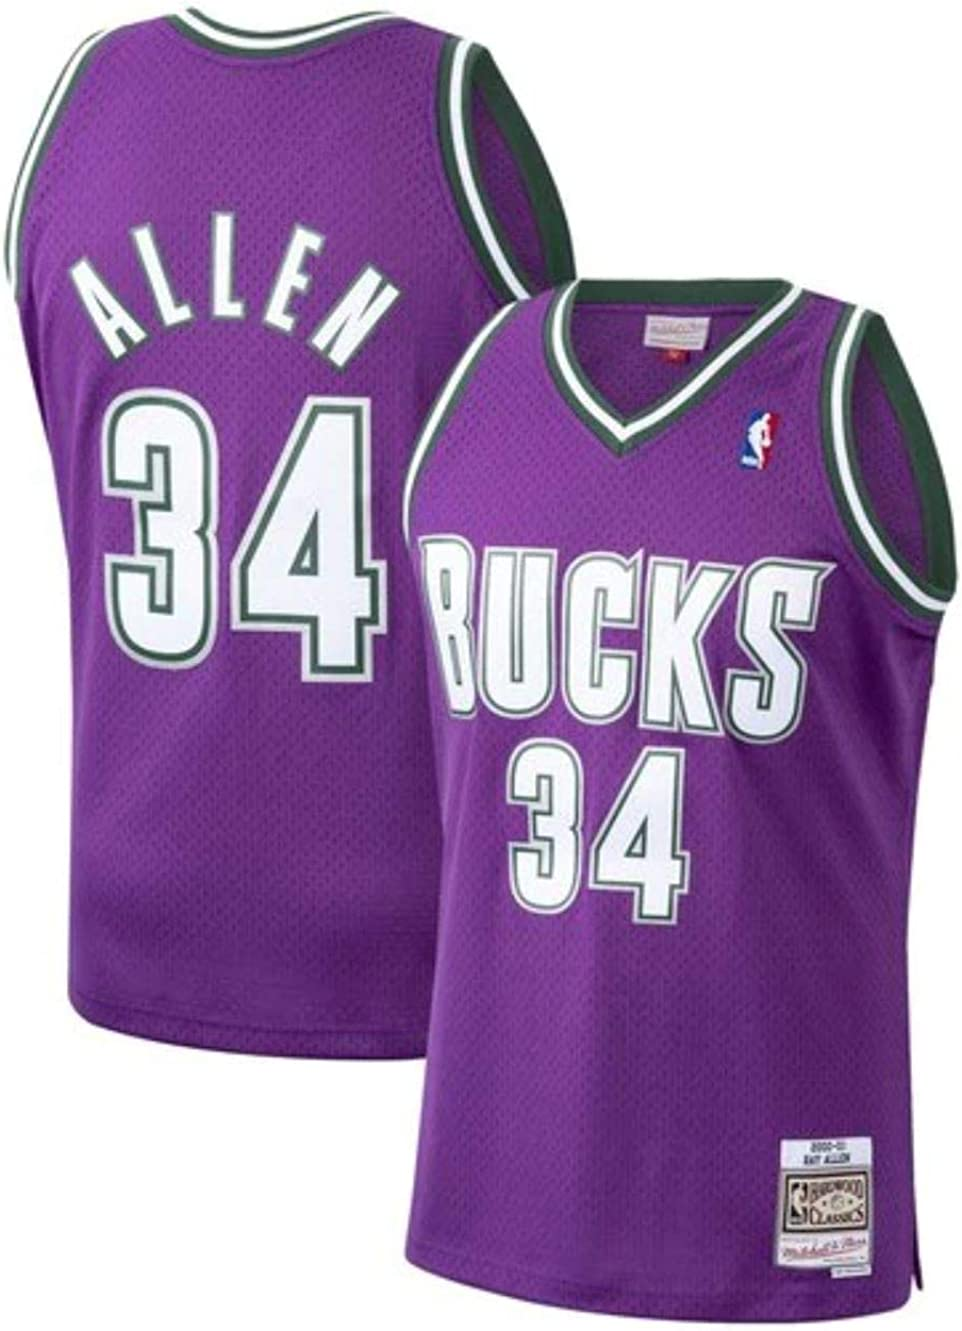 Amazon Com Ray Allen Milwaukee Bucks Men S Purple 2000 01 Road Hardwood Classics Swingman Jersey Medium Clothing